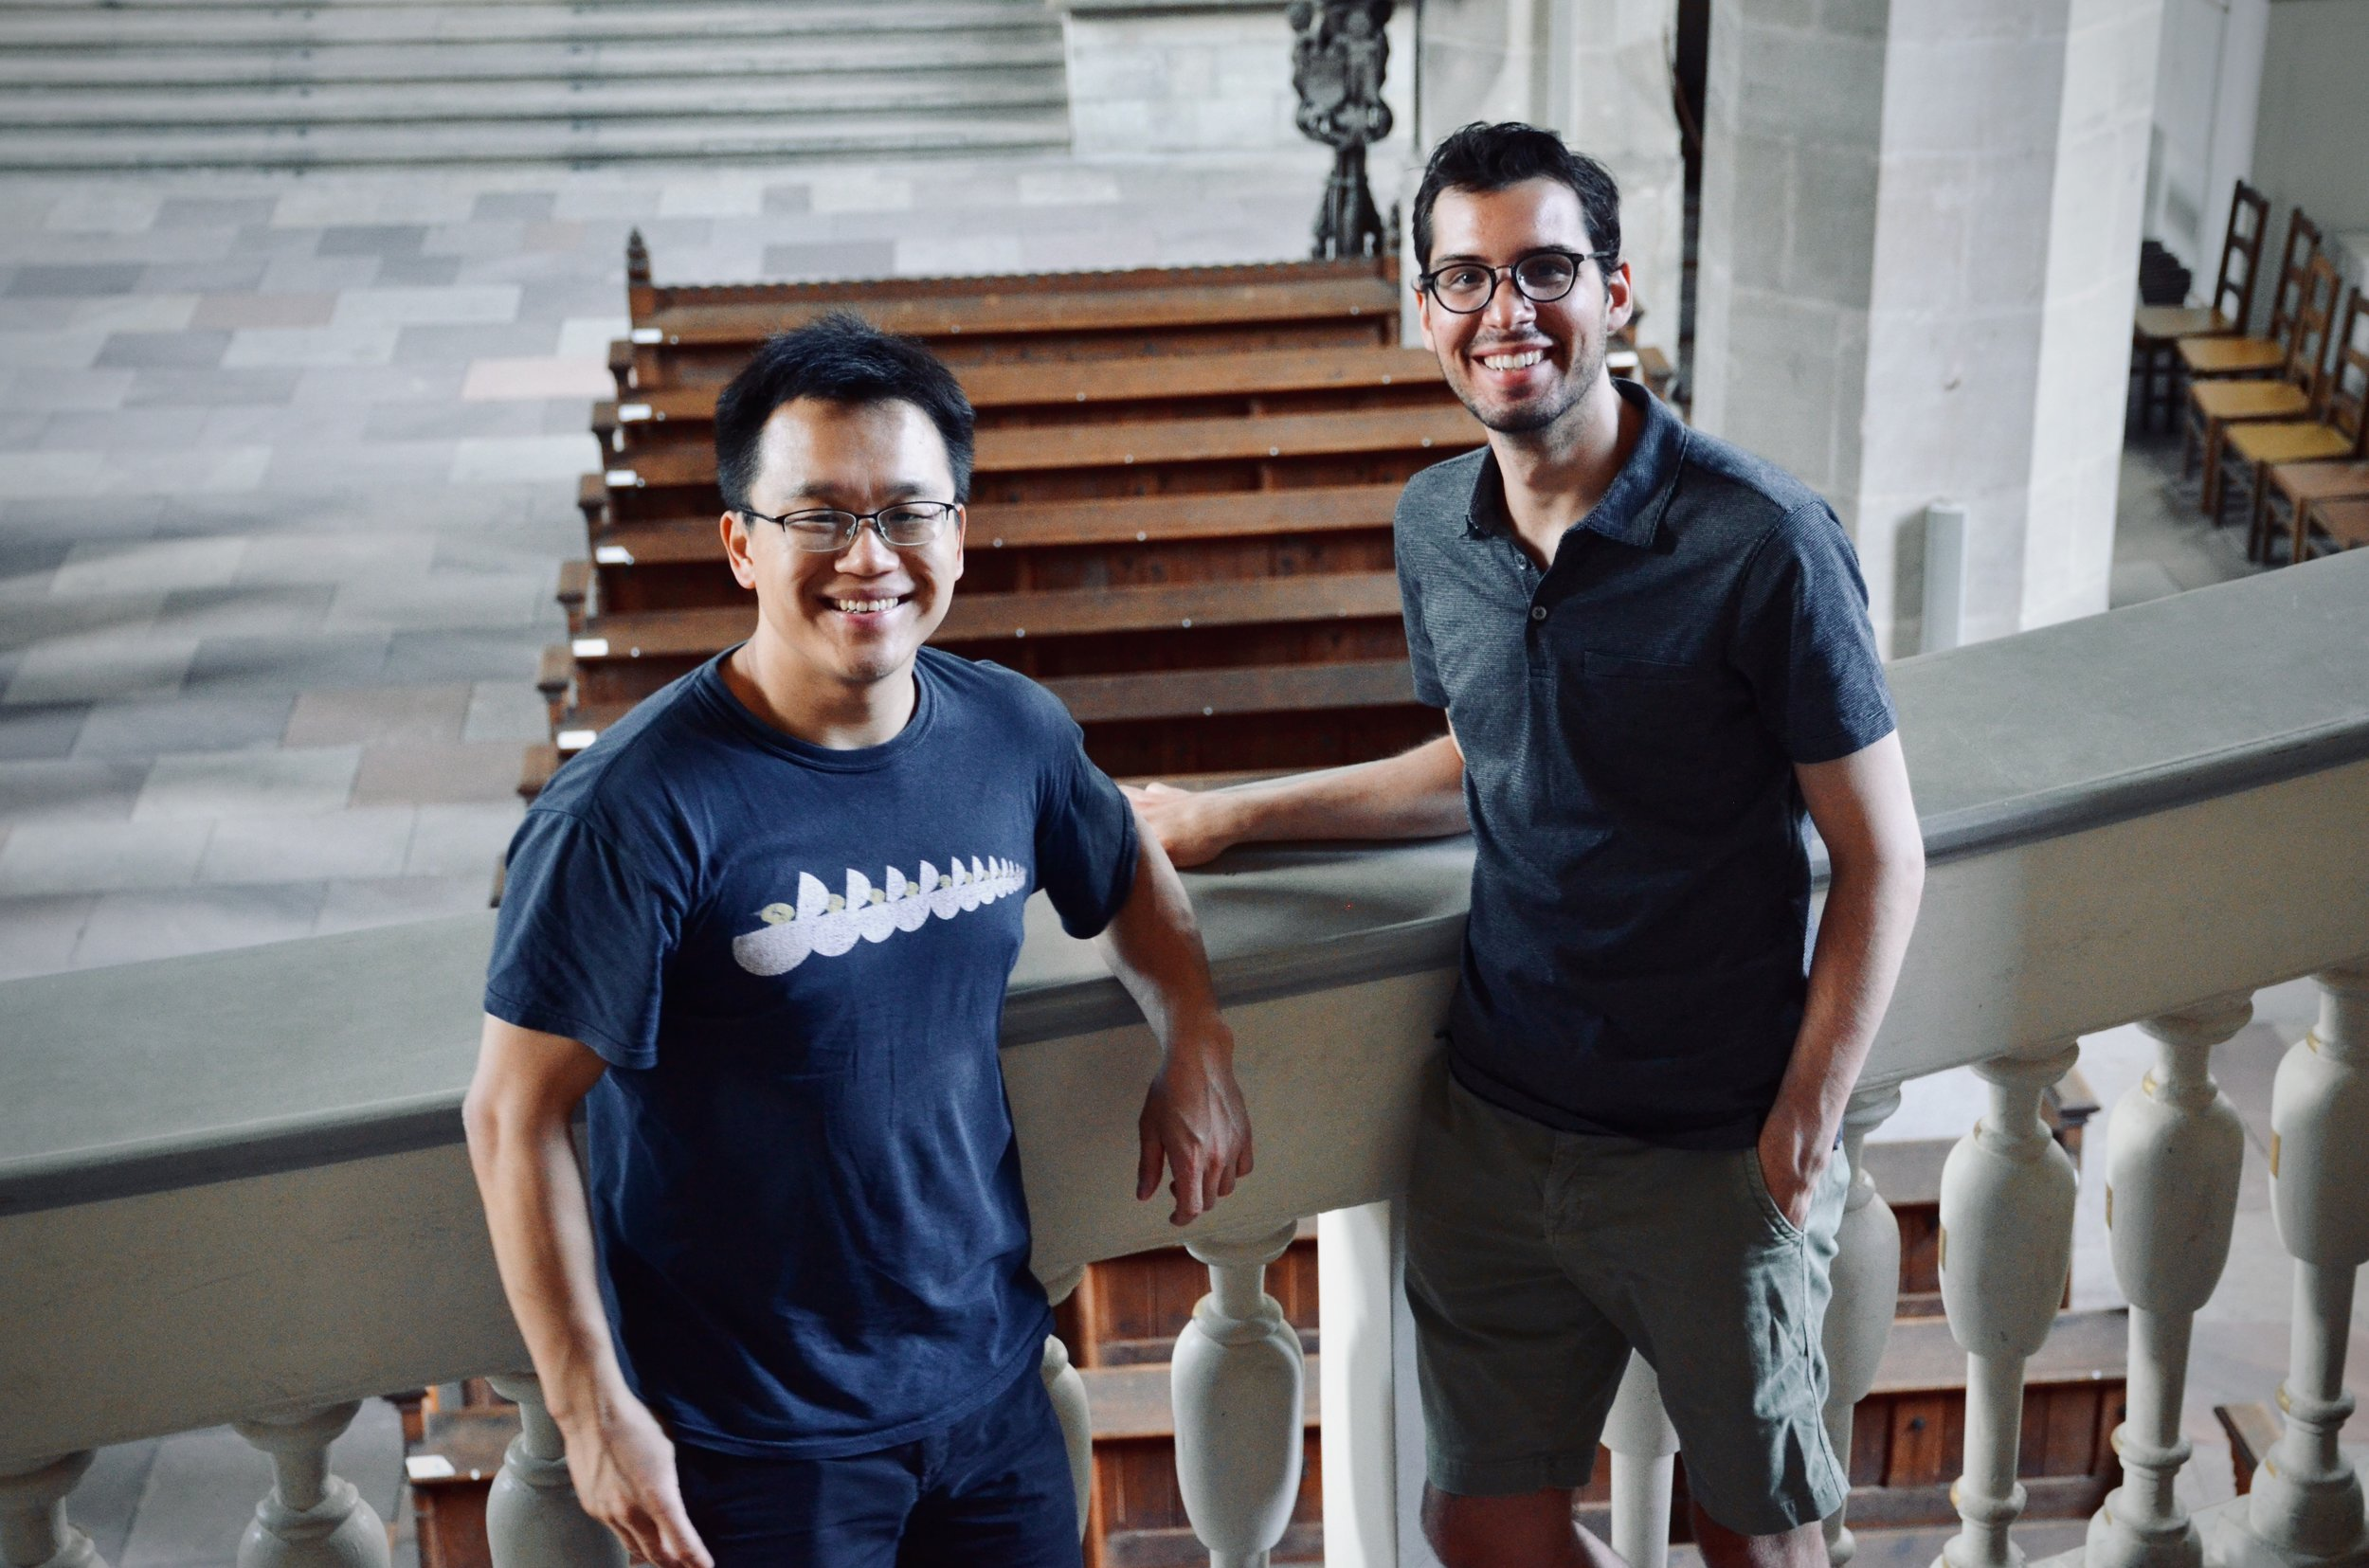 Adrian Cho and Nick Capozzoli enjoy the 1855 Ladegast Organ, Merseburg Dom.